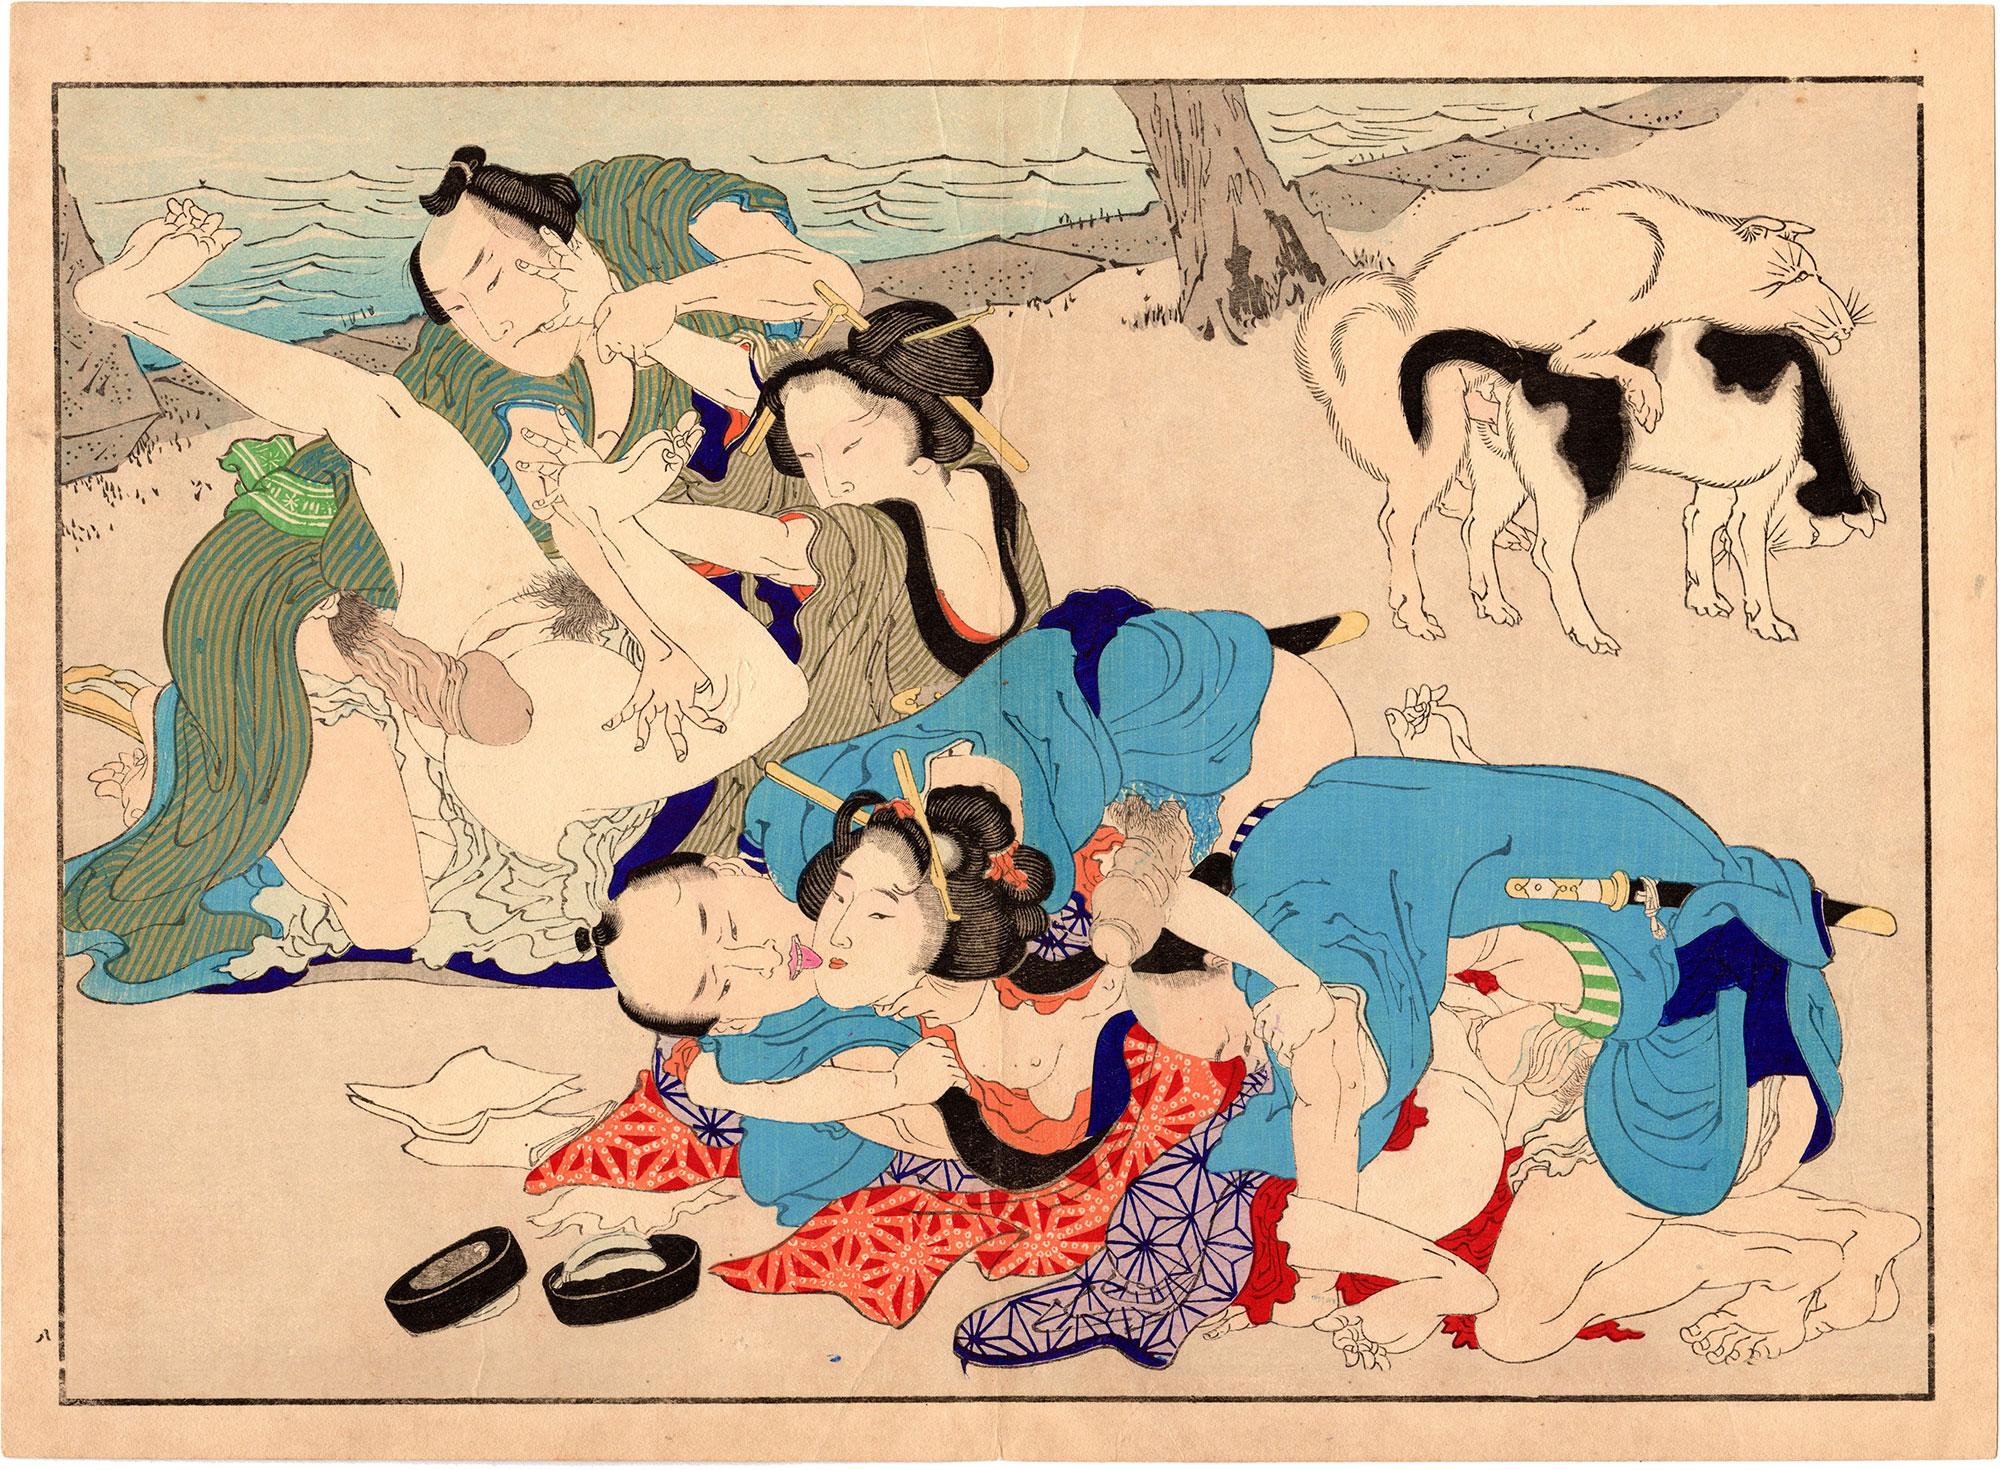 A COUNTRY'S GLORY 08 (Ikeda Terukata)